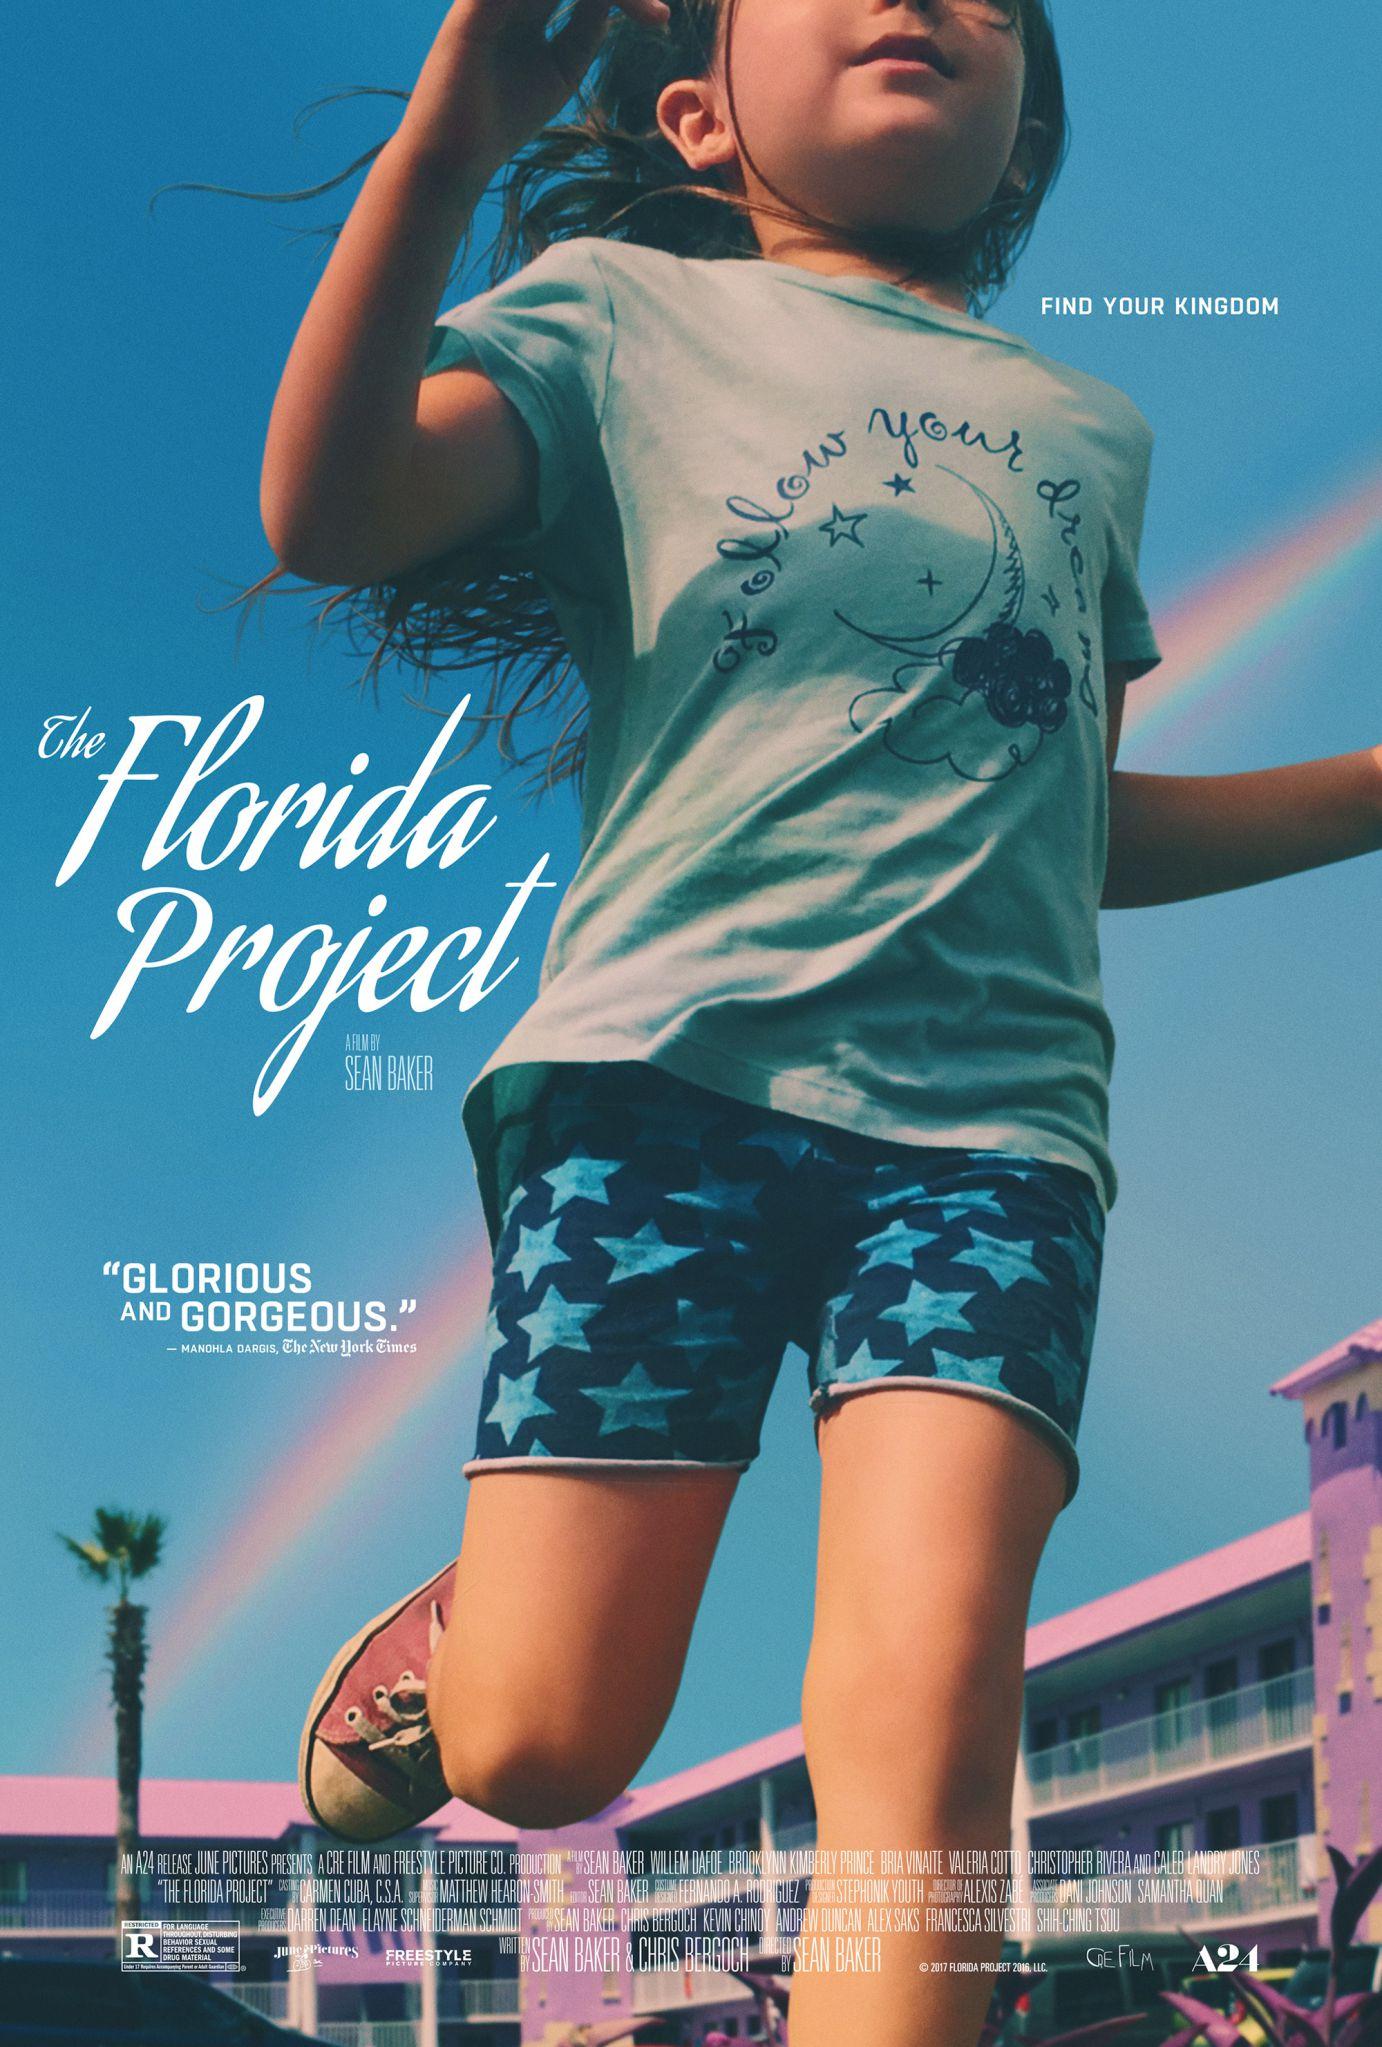 thefloridaproject-poster